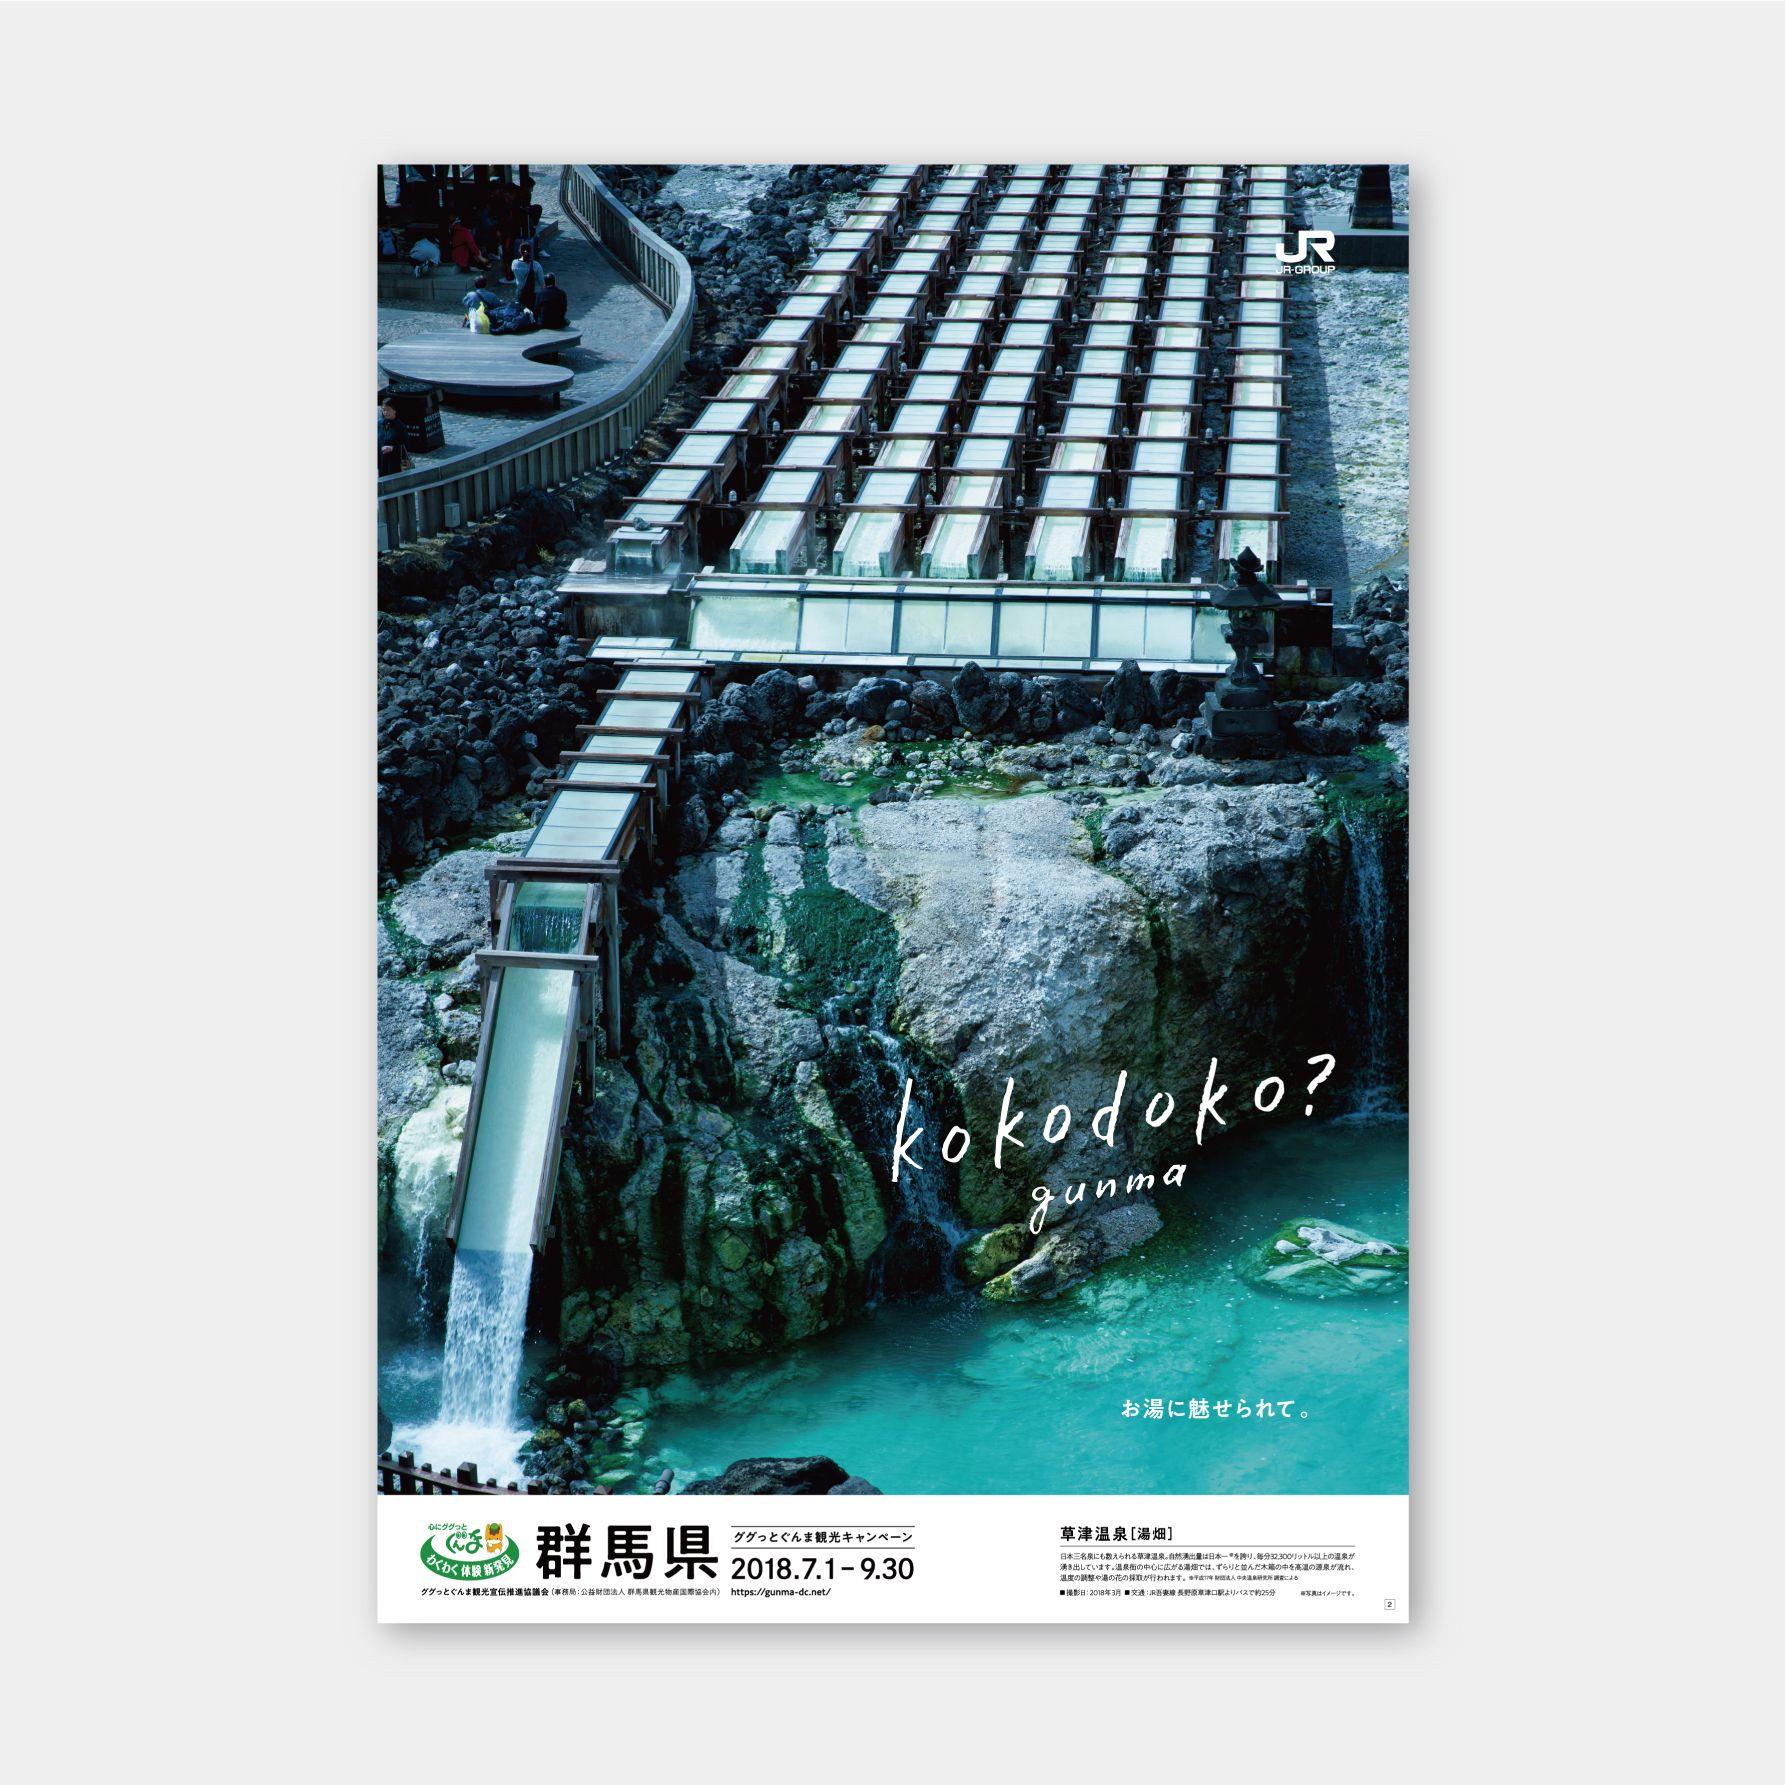 Jrグループ 群馬県観光5連ポスター 草津温泉 湯畑 観光 温泉 ポスター